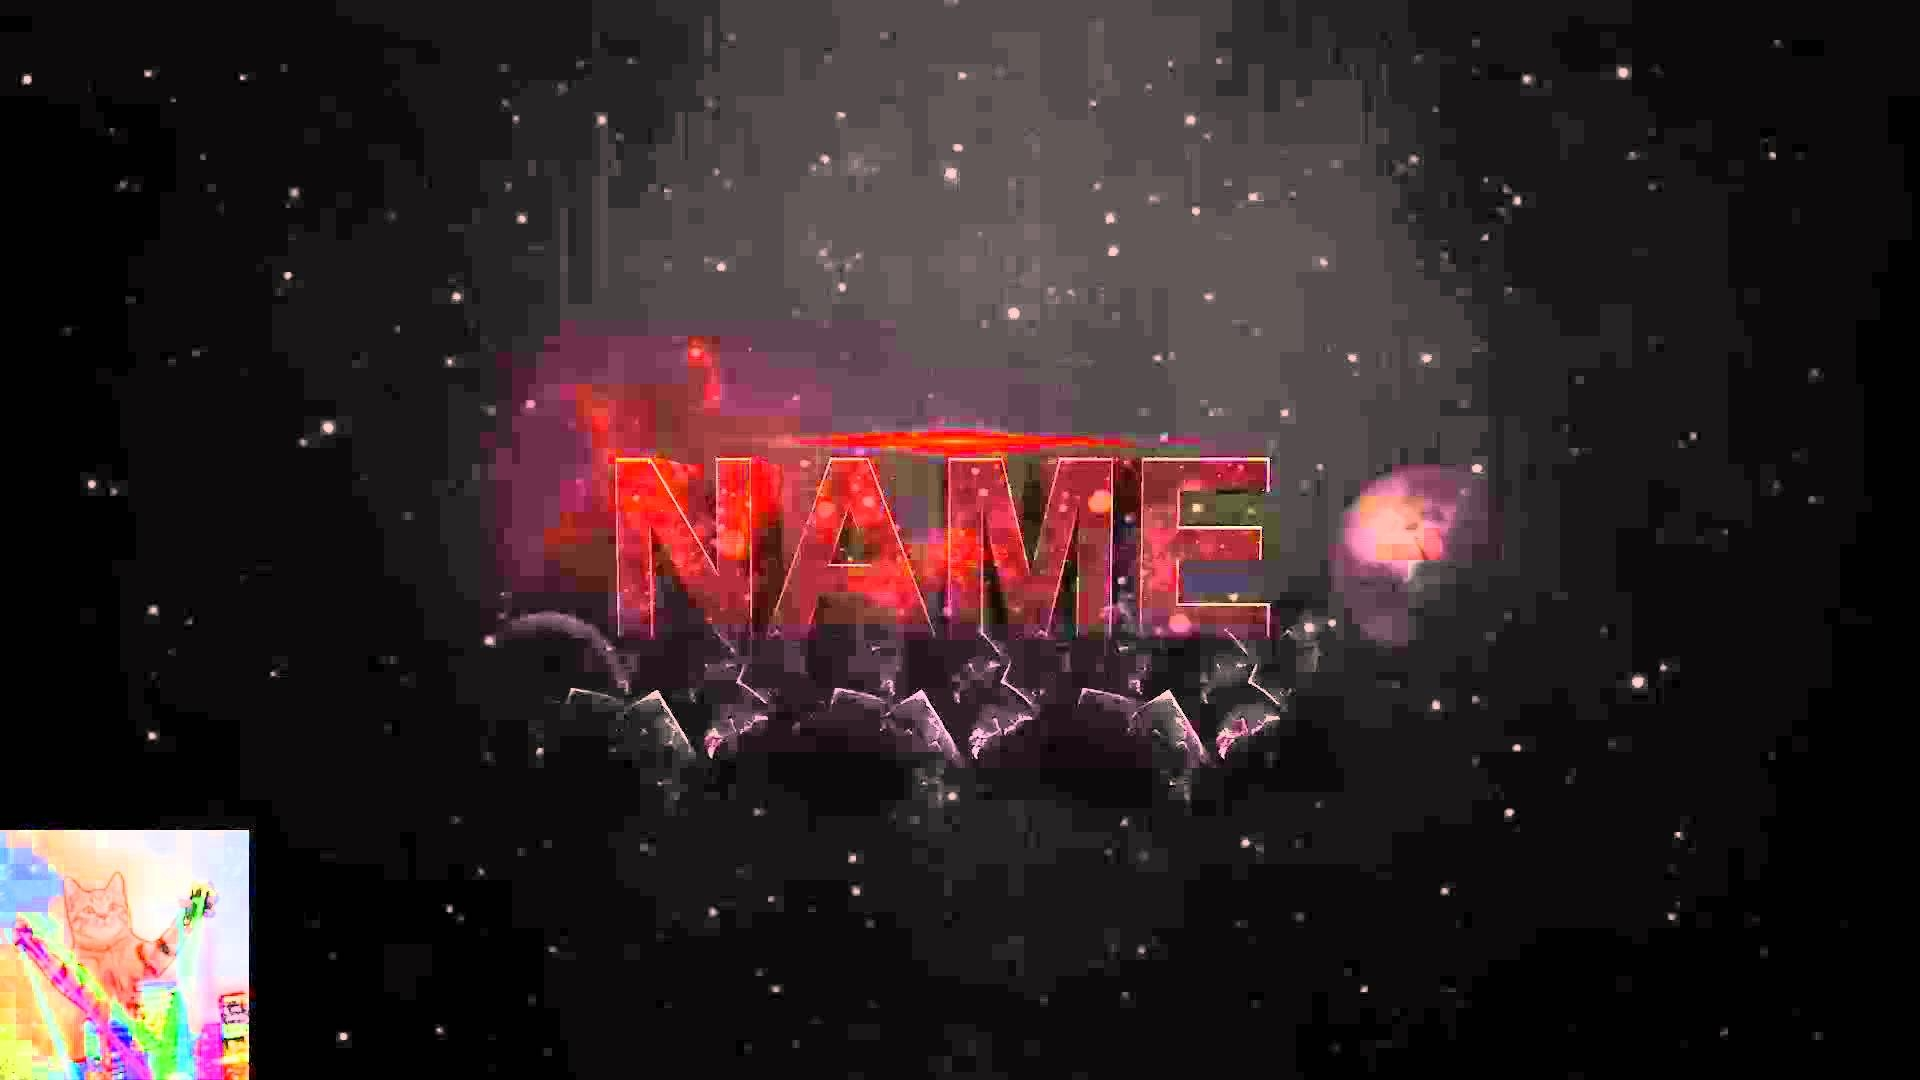 Best-desktop-background-template-Youtube-Background-Template-Photoshop-Amp-Cinema-d-Youtube-per-wallpaper-wp3403104